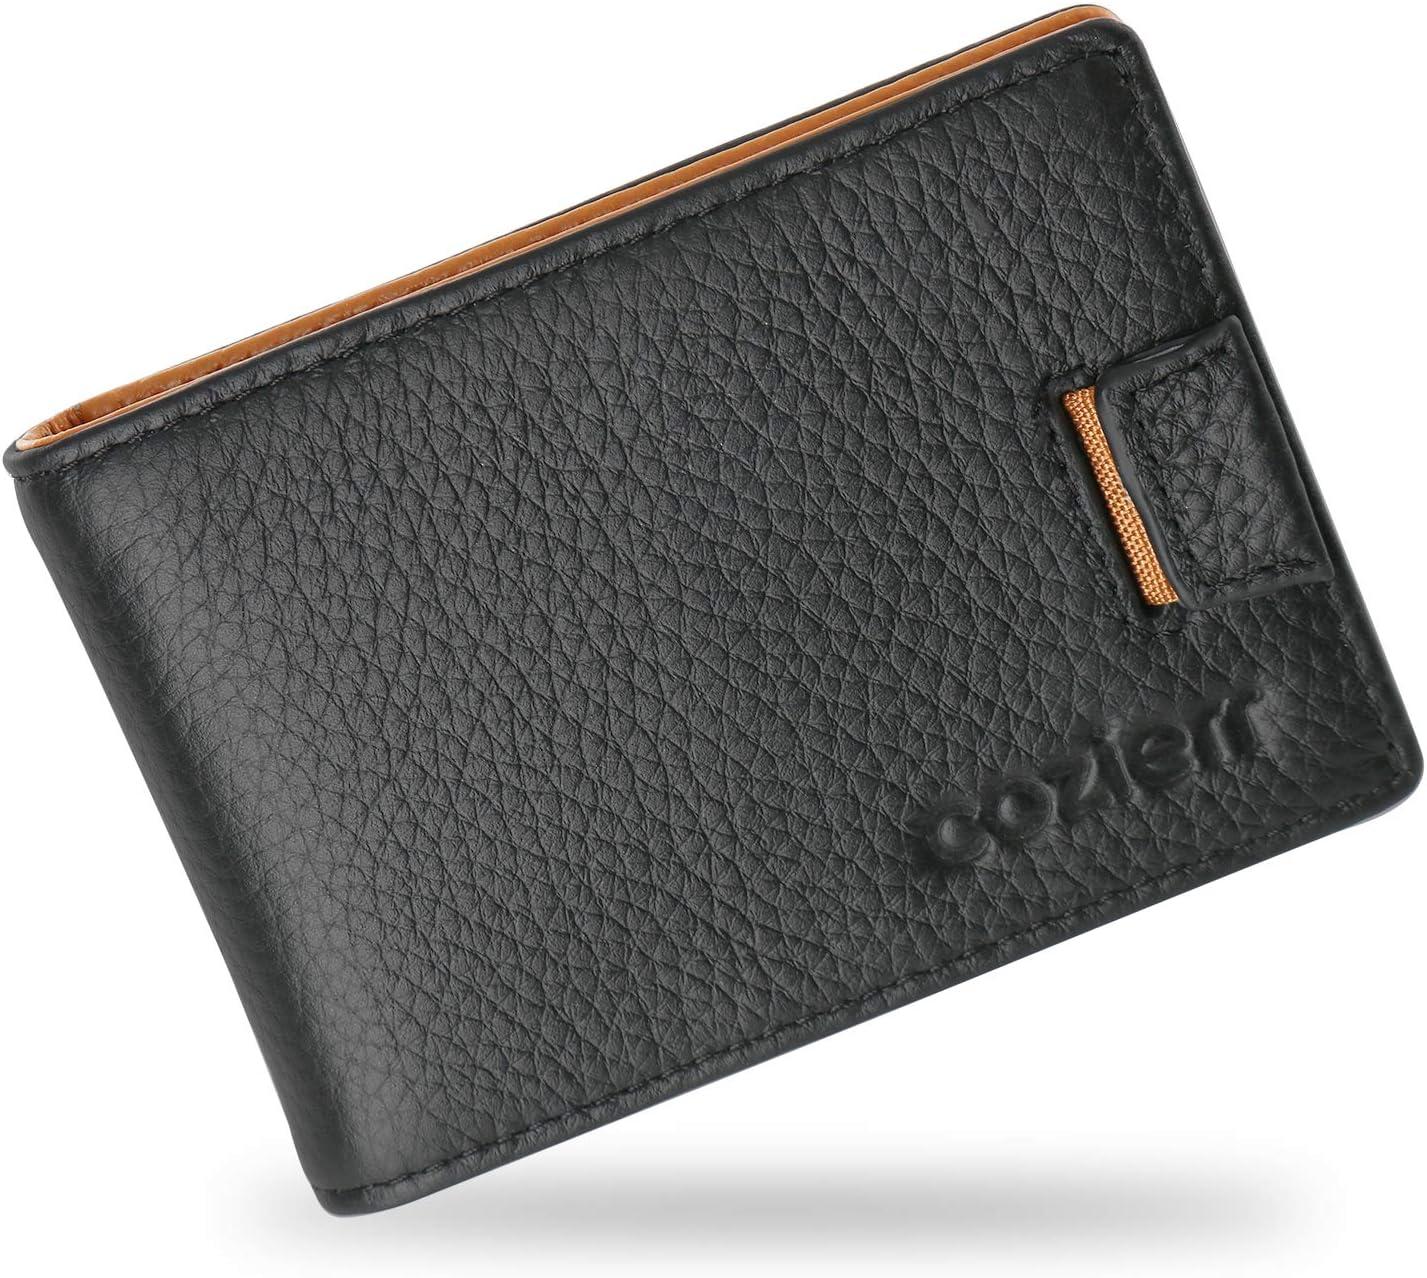 Amazon.com: Billetera minimalista RFID para hombre ...